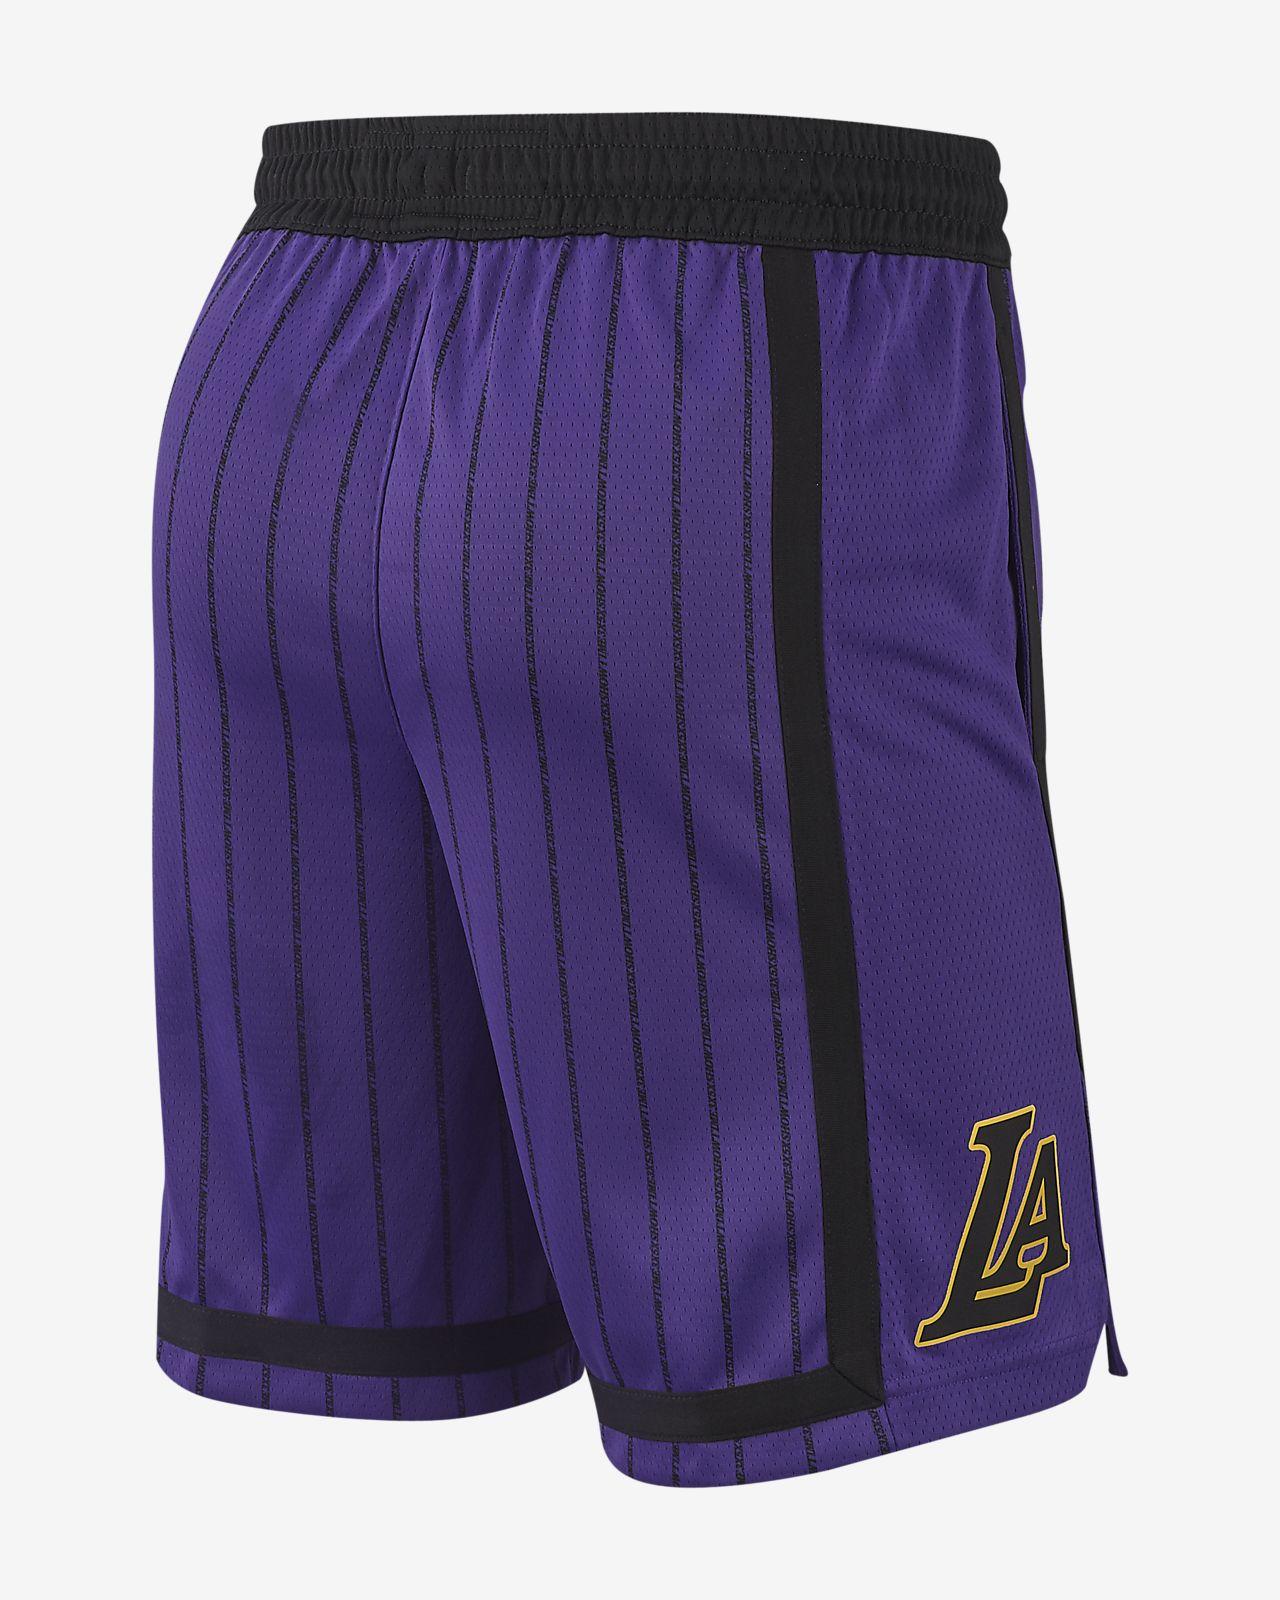 8e12453c4ab Los Angeles Lakers City Edition Swingman Men s Nike NBA Shorts. Nike ...